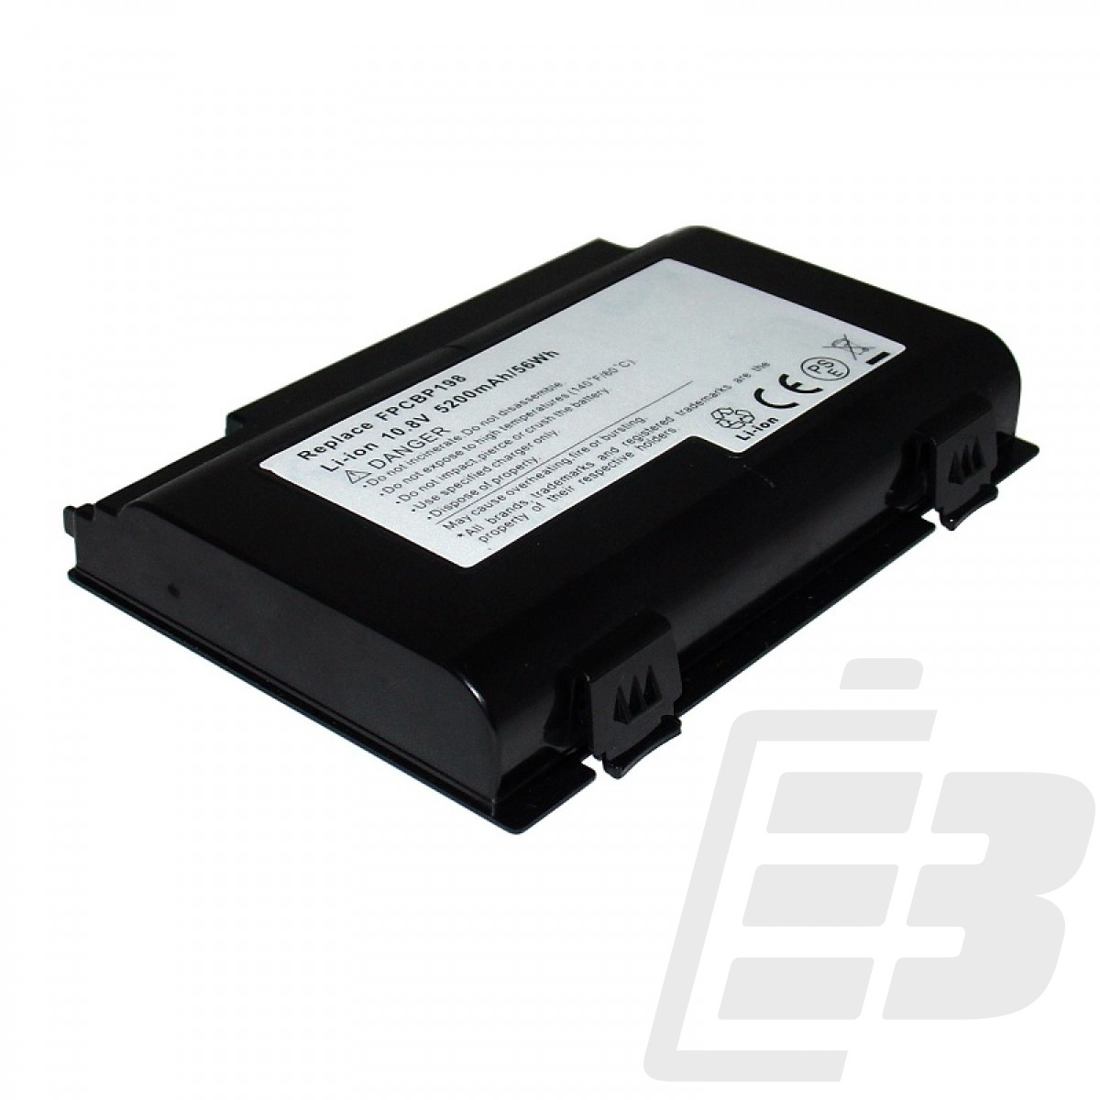 Laptop battery Fujitsu LifeBook E8410_1